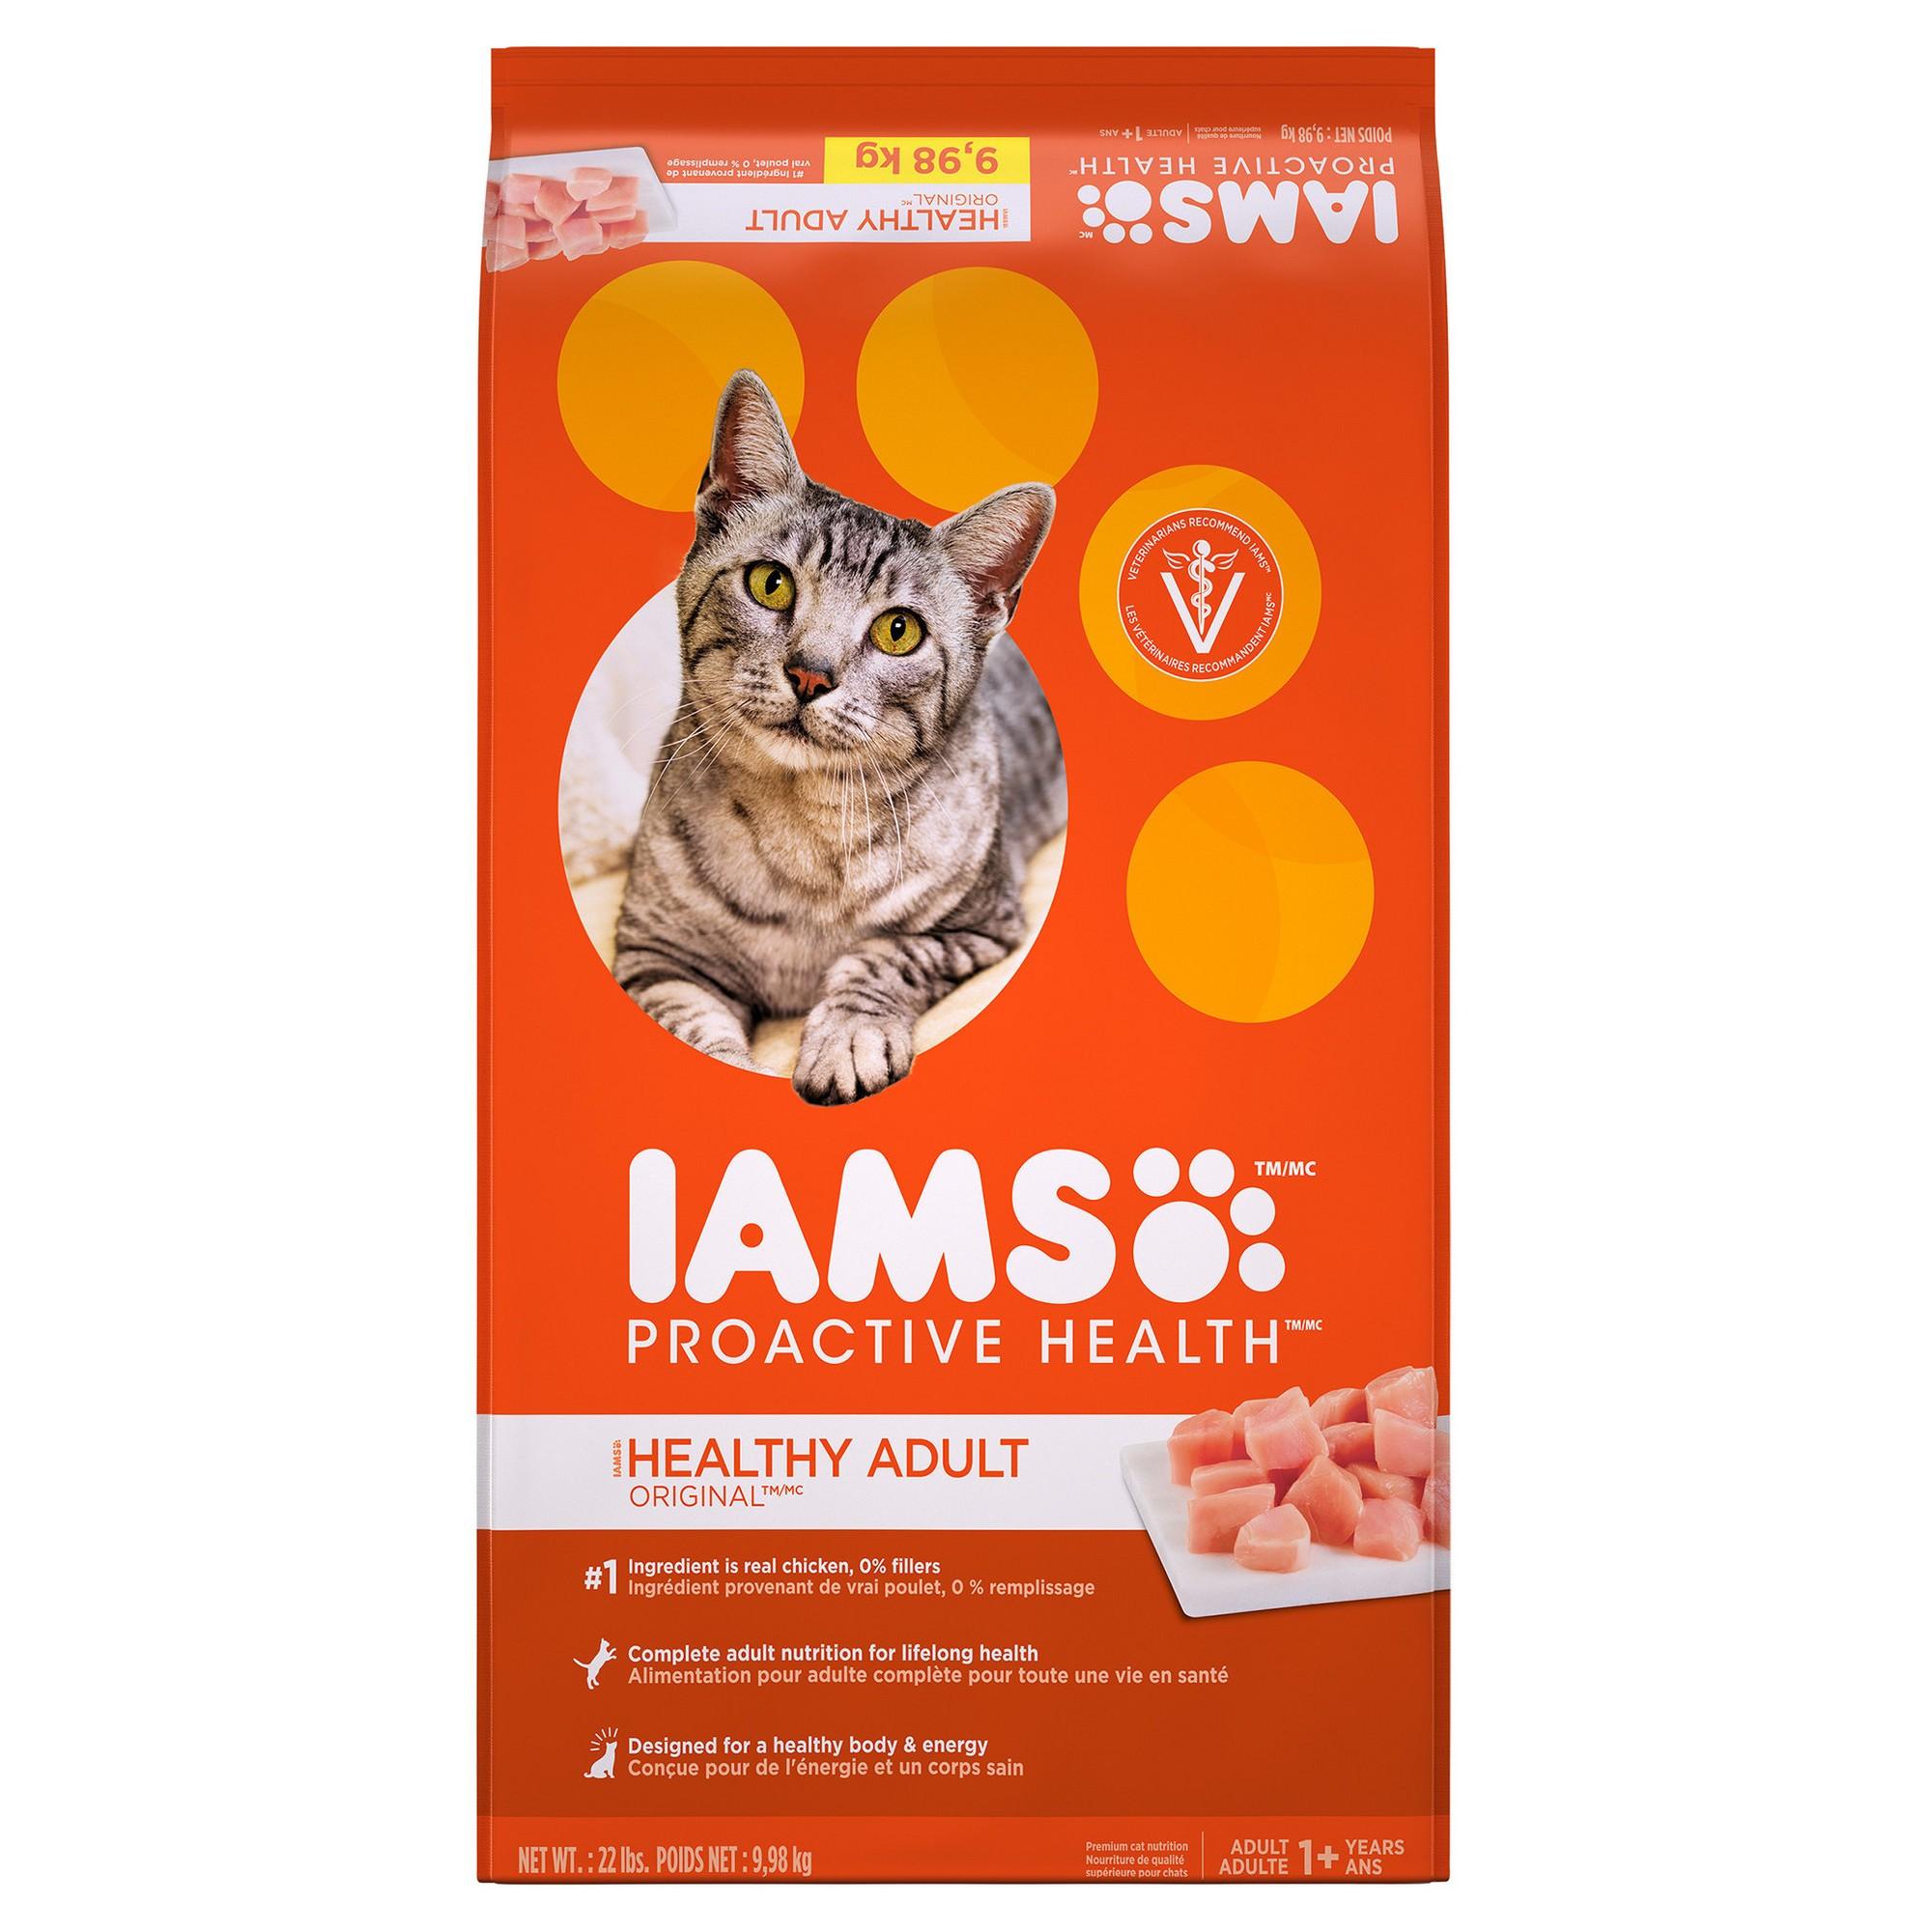 Iams Proactive Health Healthy Adult Original Dry Cat Food 22lbs